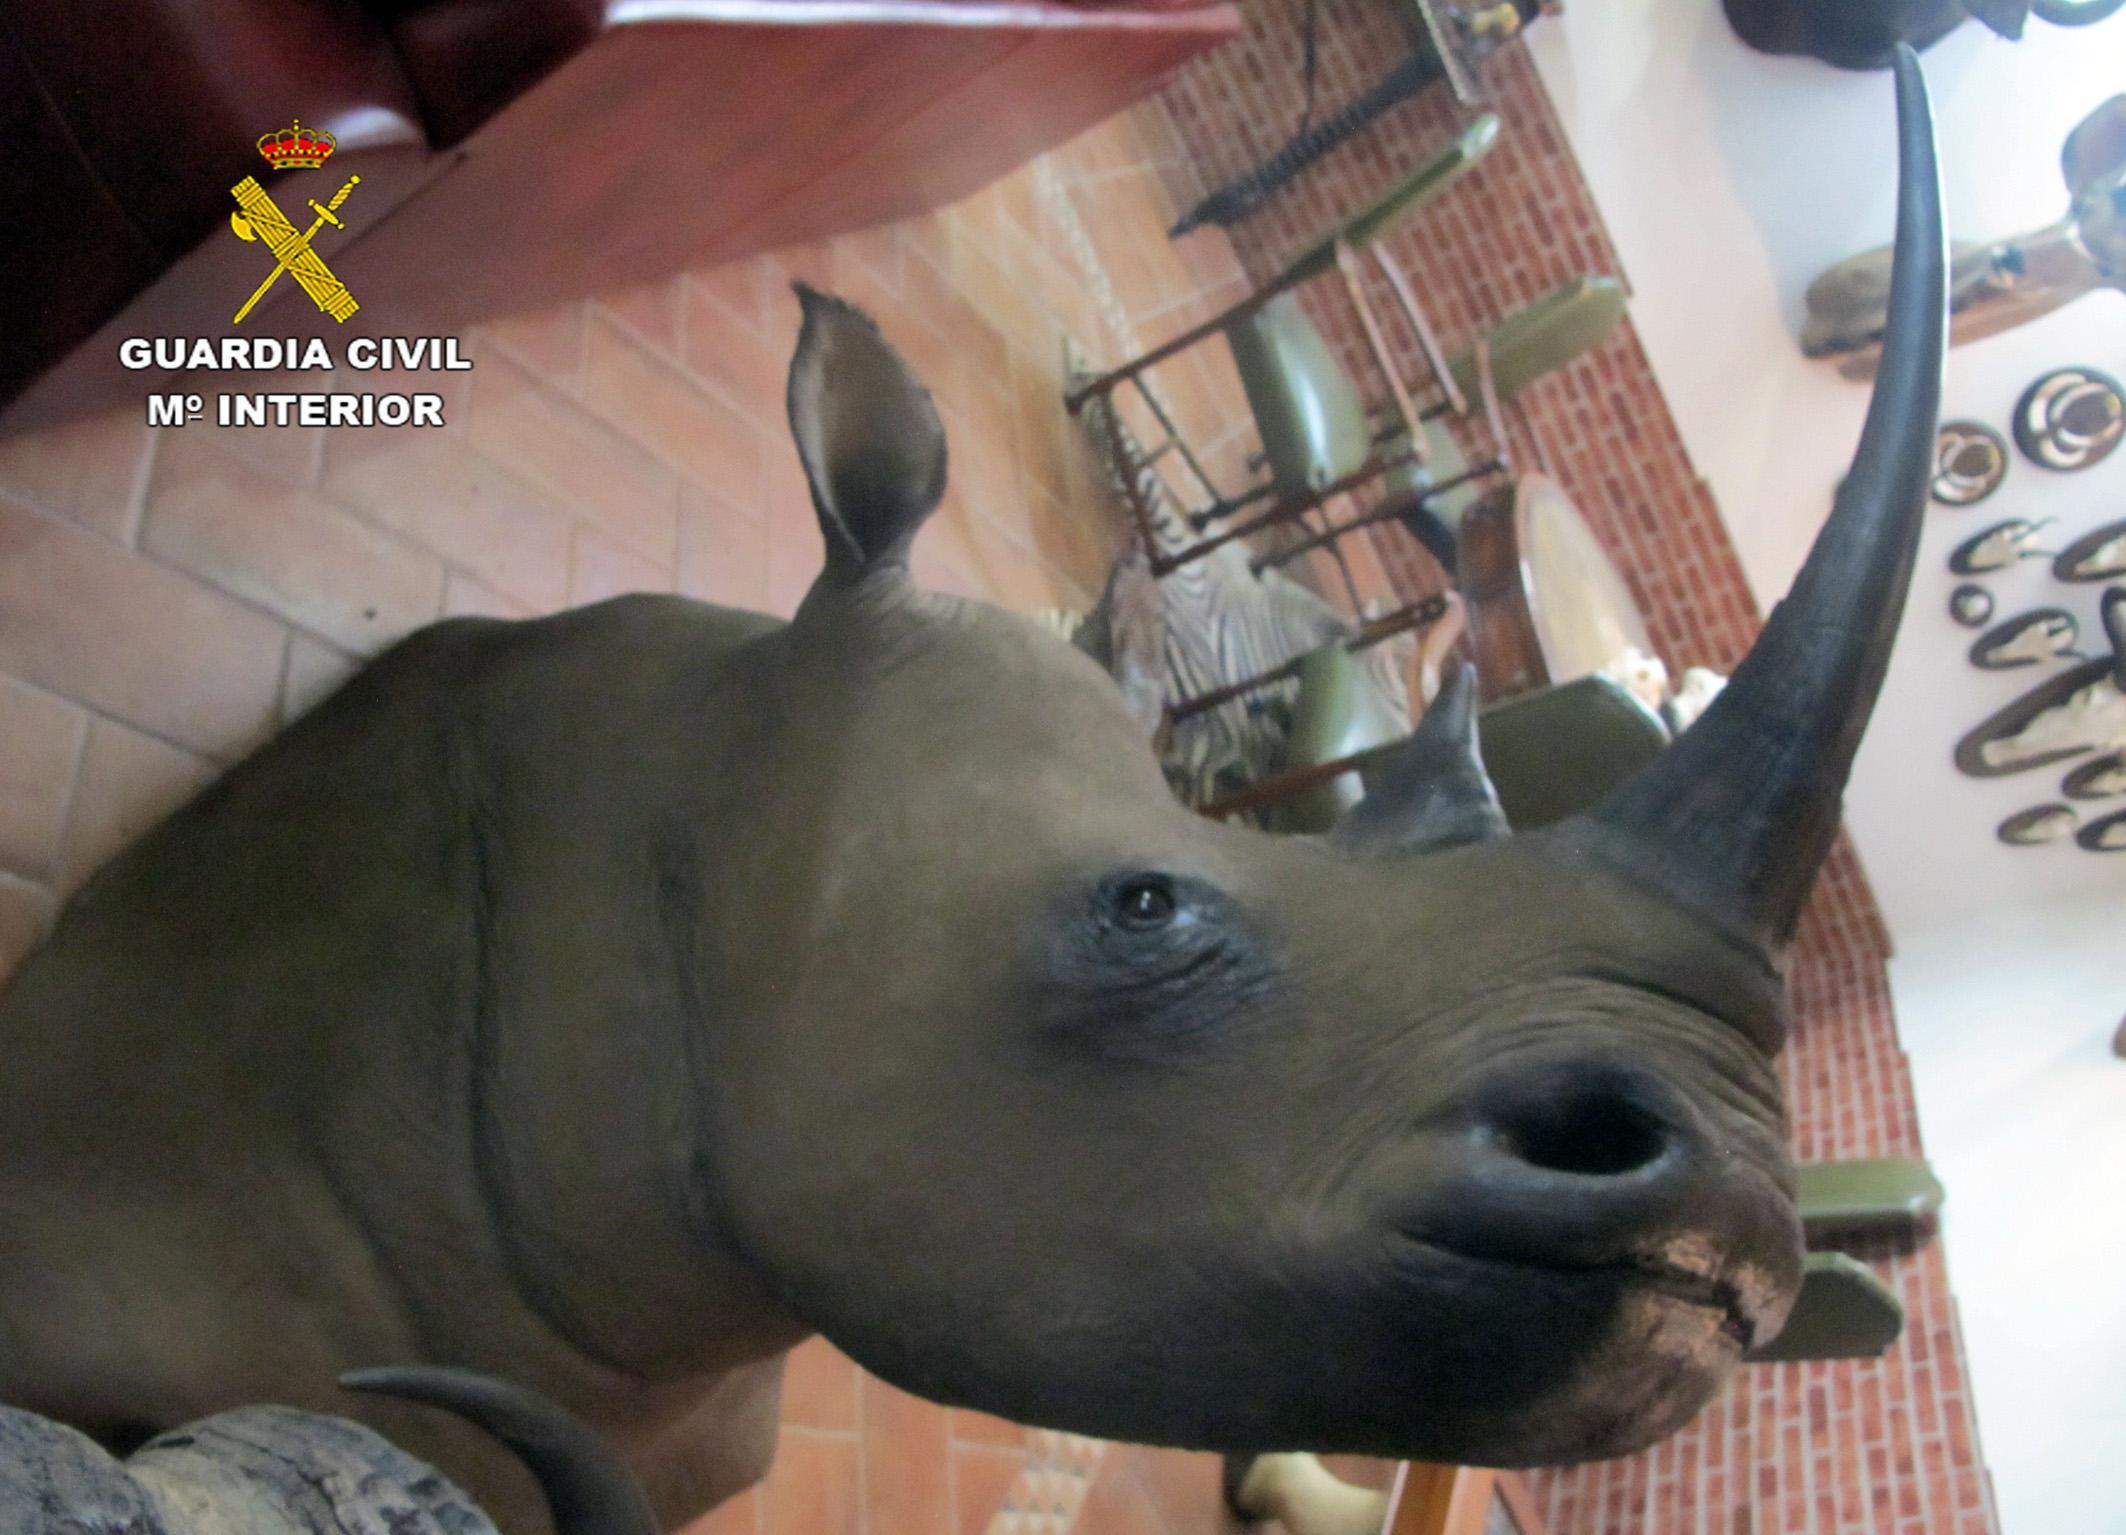 Cabeza de rinoceronte. Imagen: Seprona